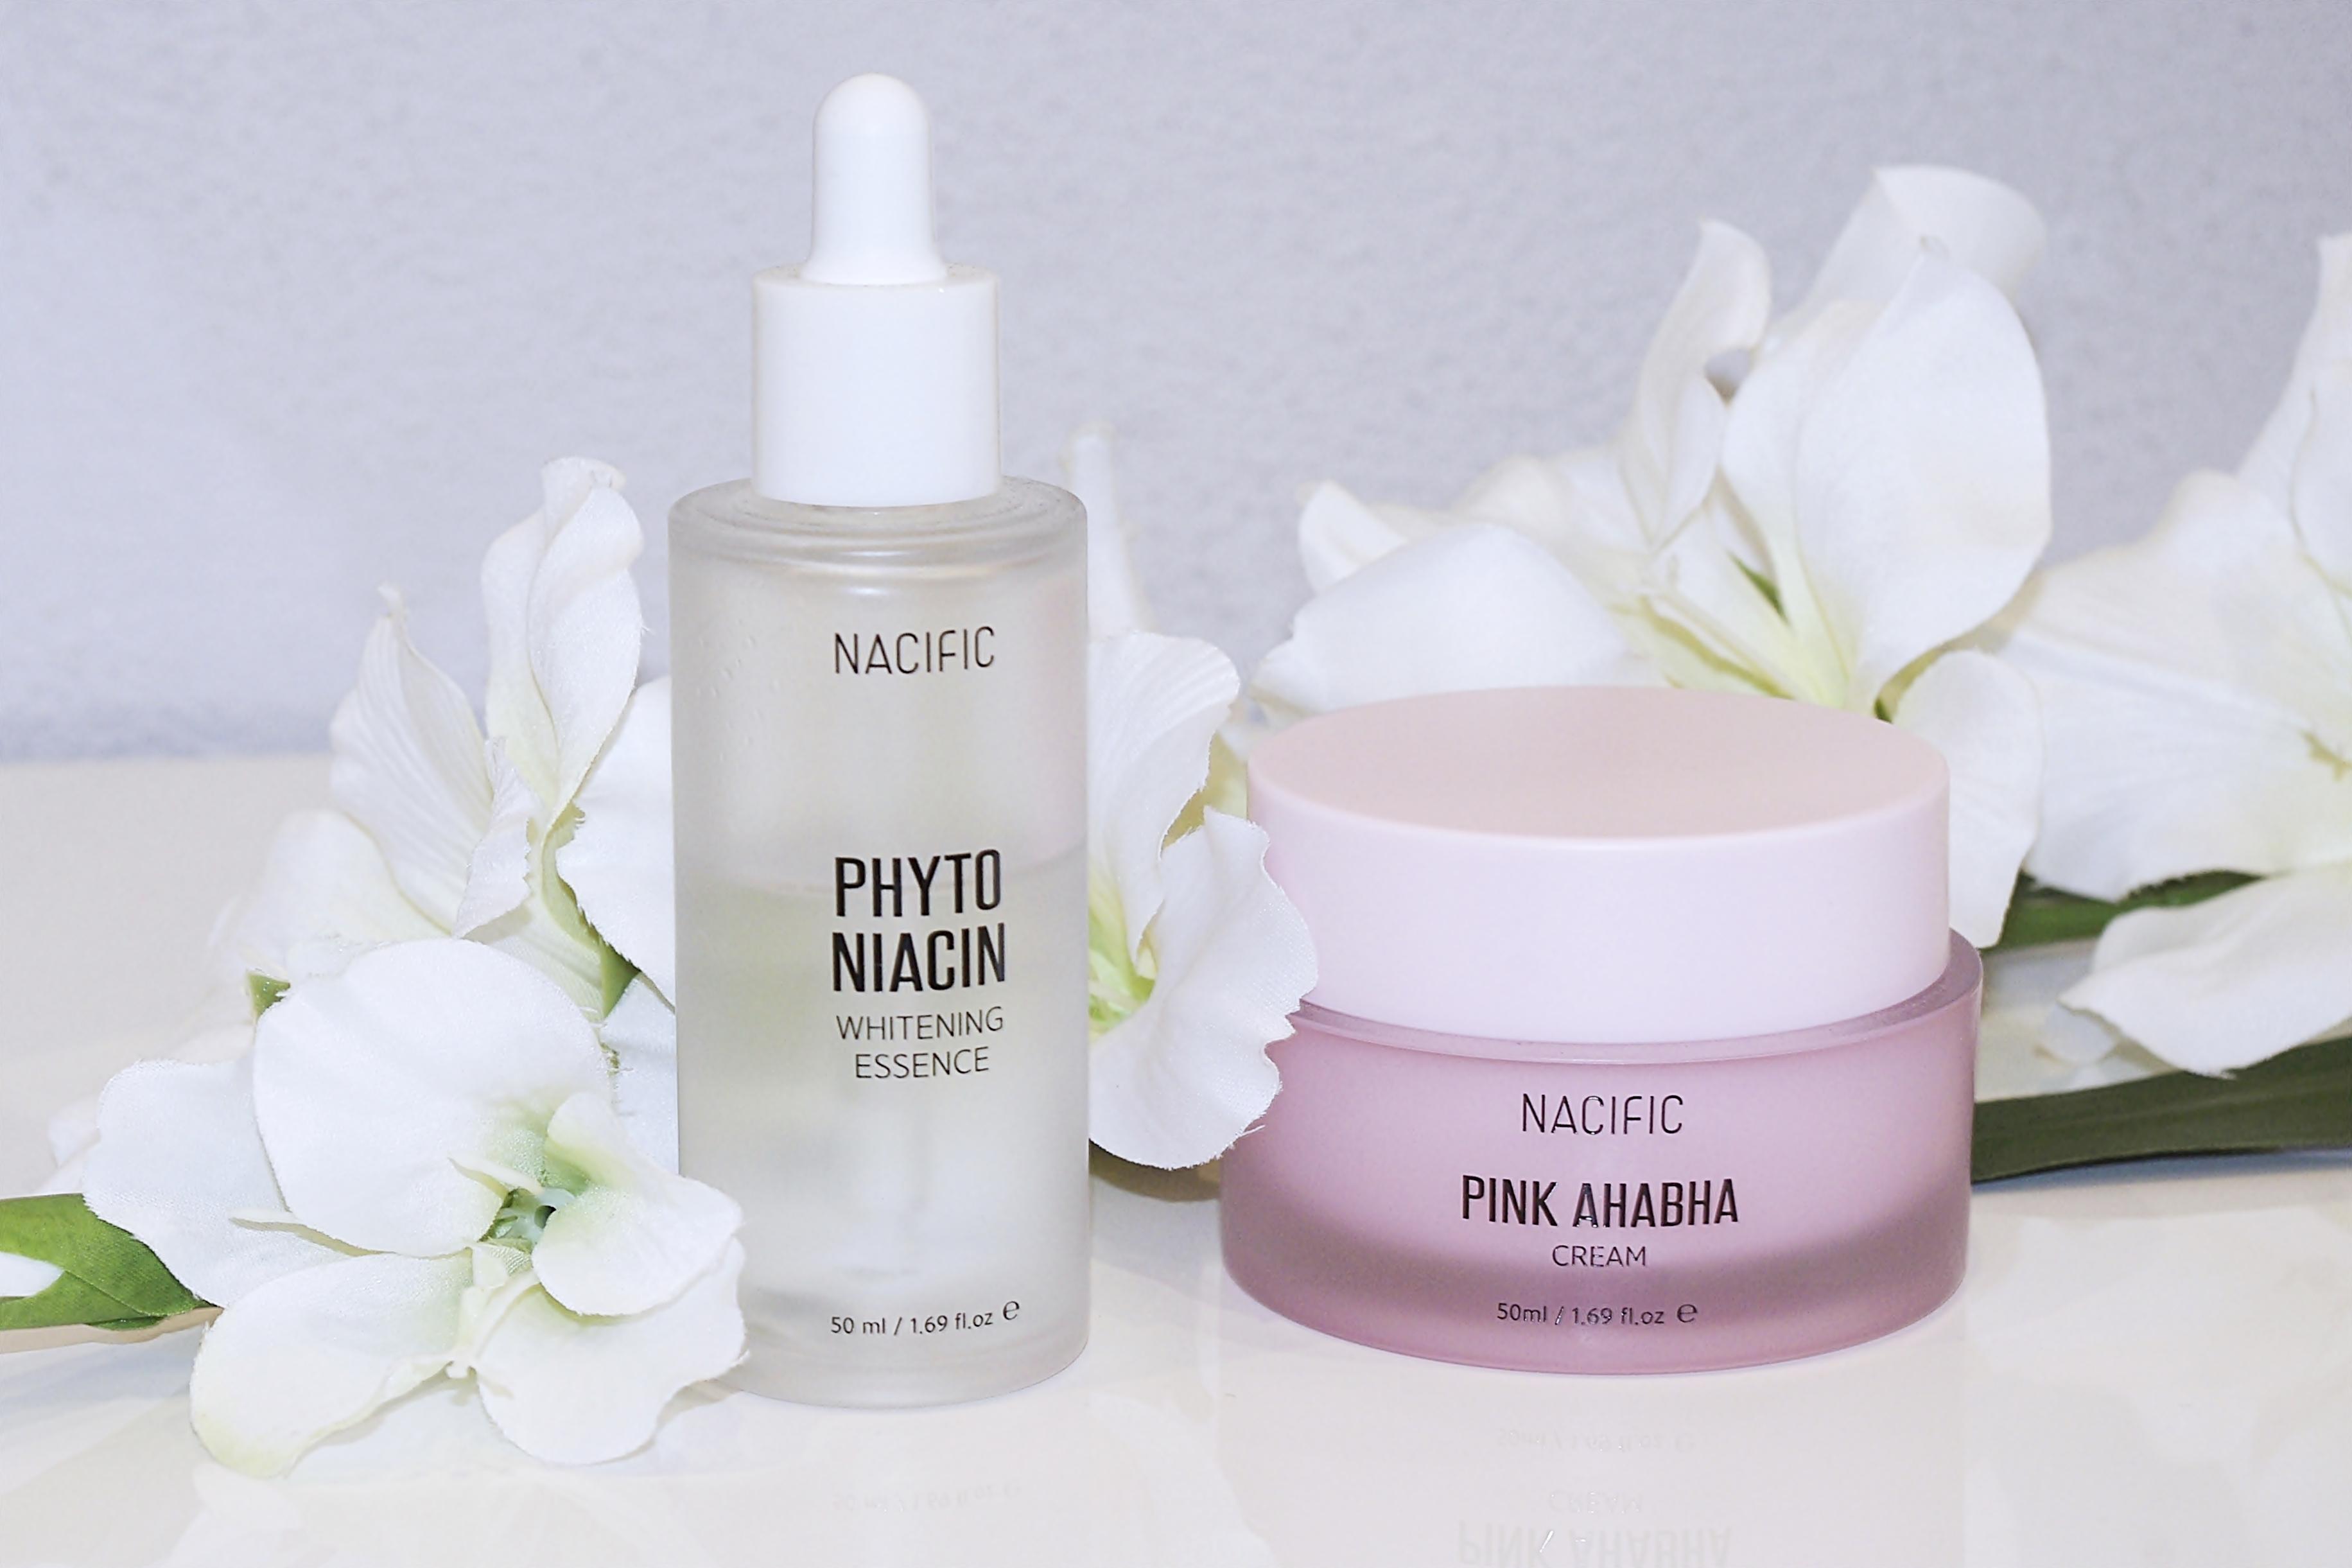 Nacific Phyto Niacin Whitening Essence i Pink AHABHA Cream